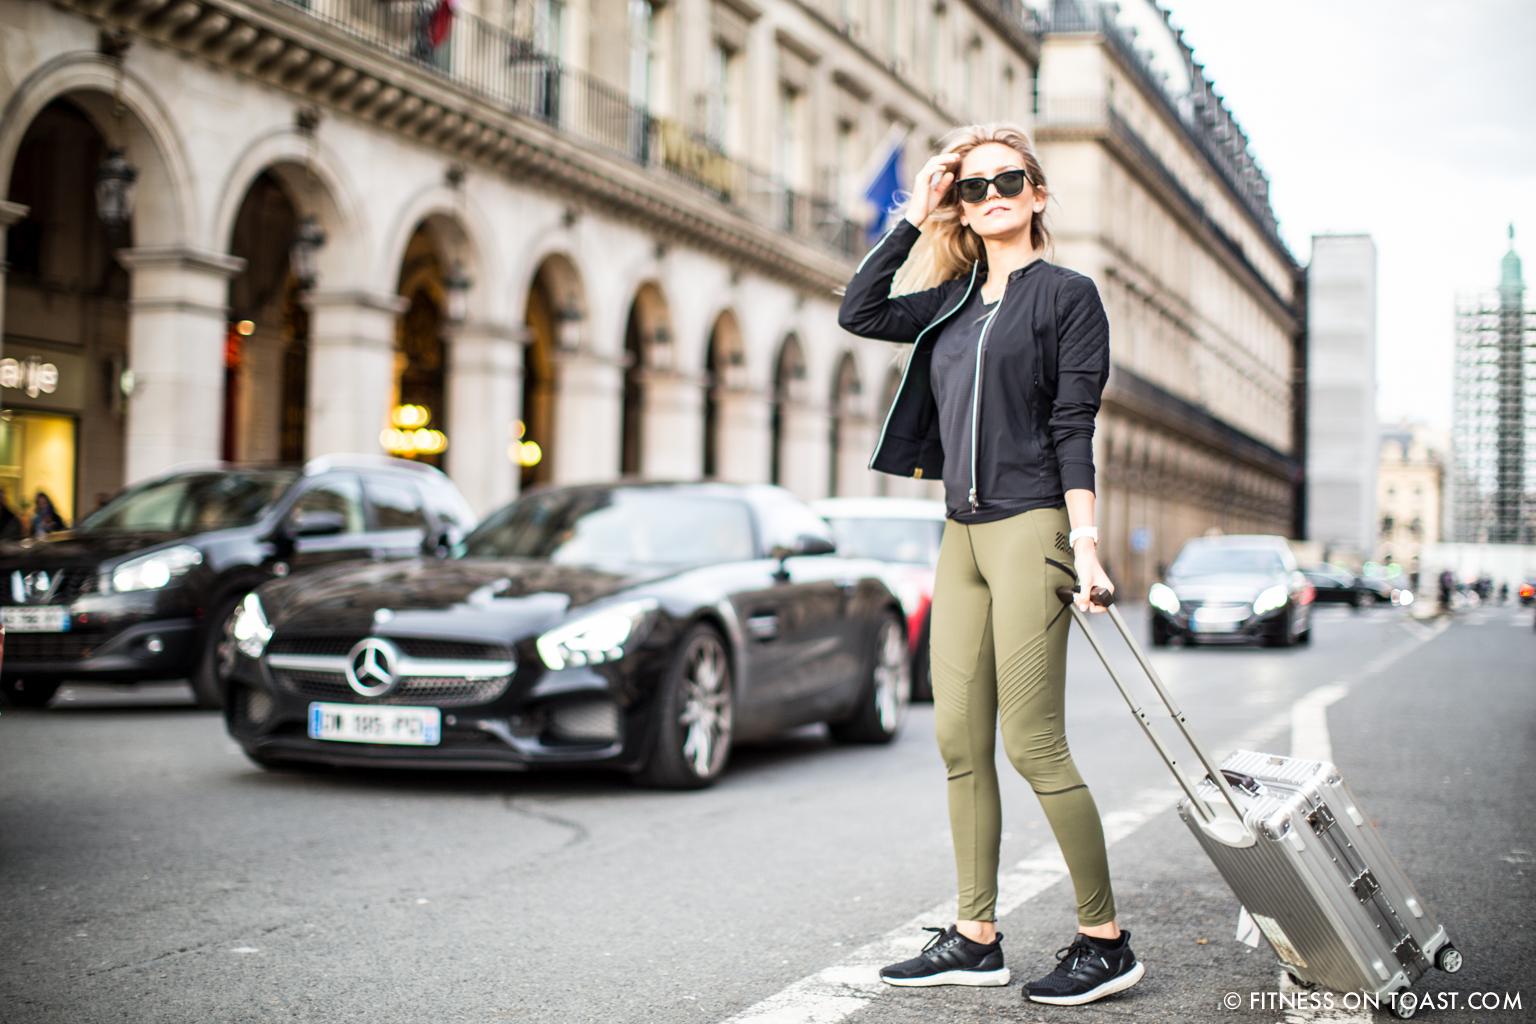 Fitness On Toast Faya Blog Girl Healthy Travel Business Leisure Wellness Westin Starwood Wellbeing partnership ambassador Paris Vendome-18